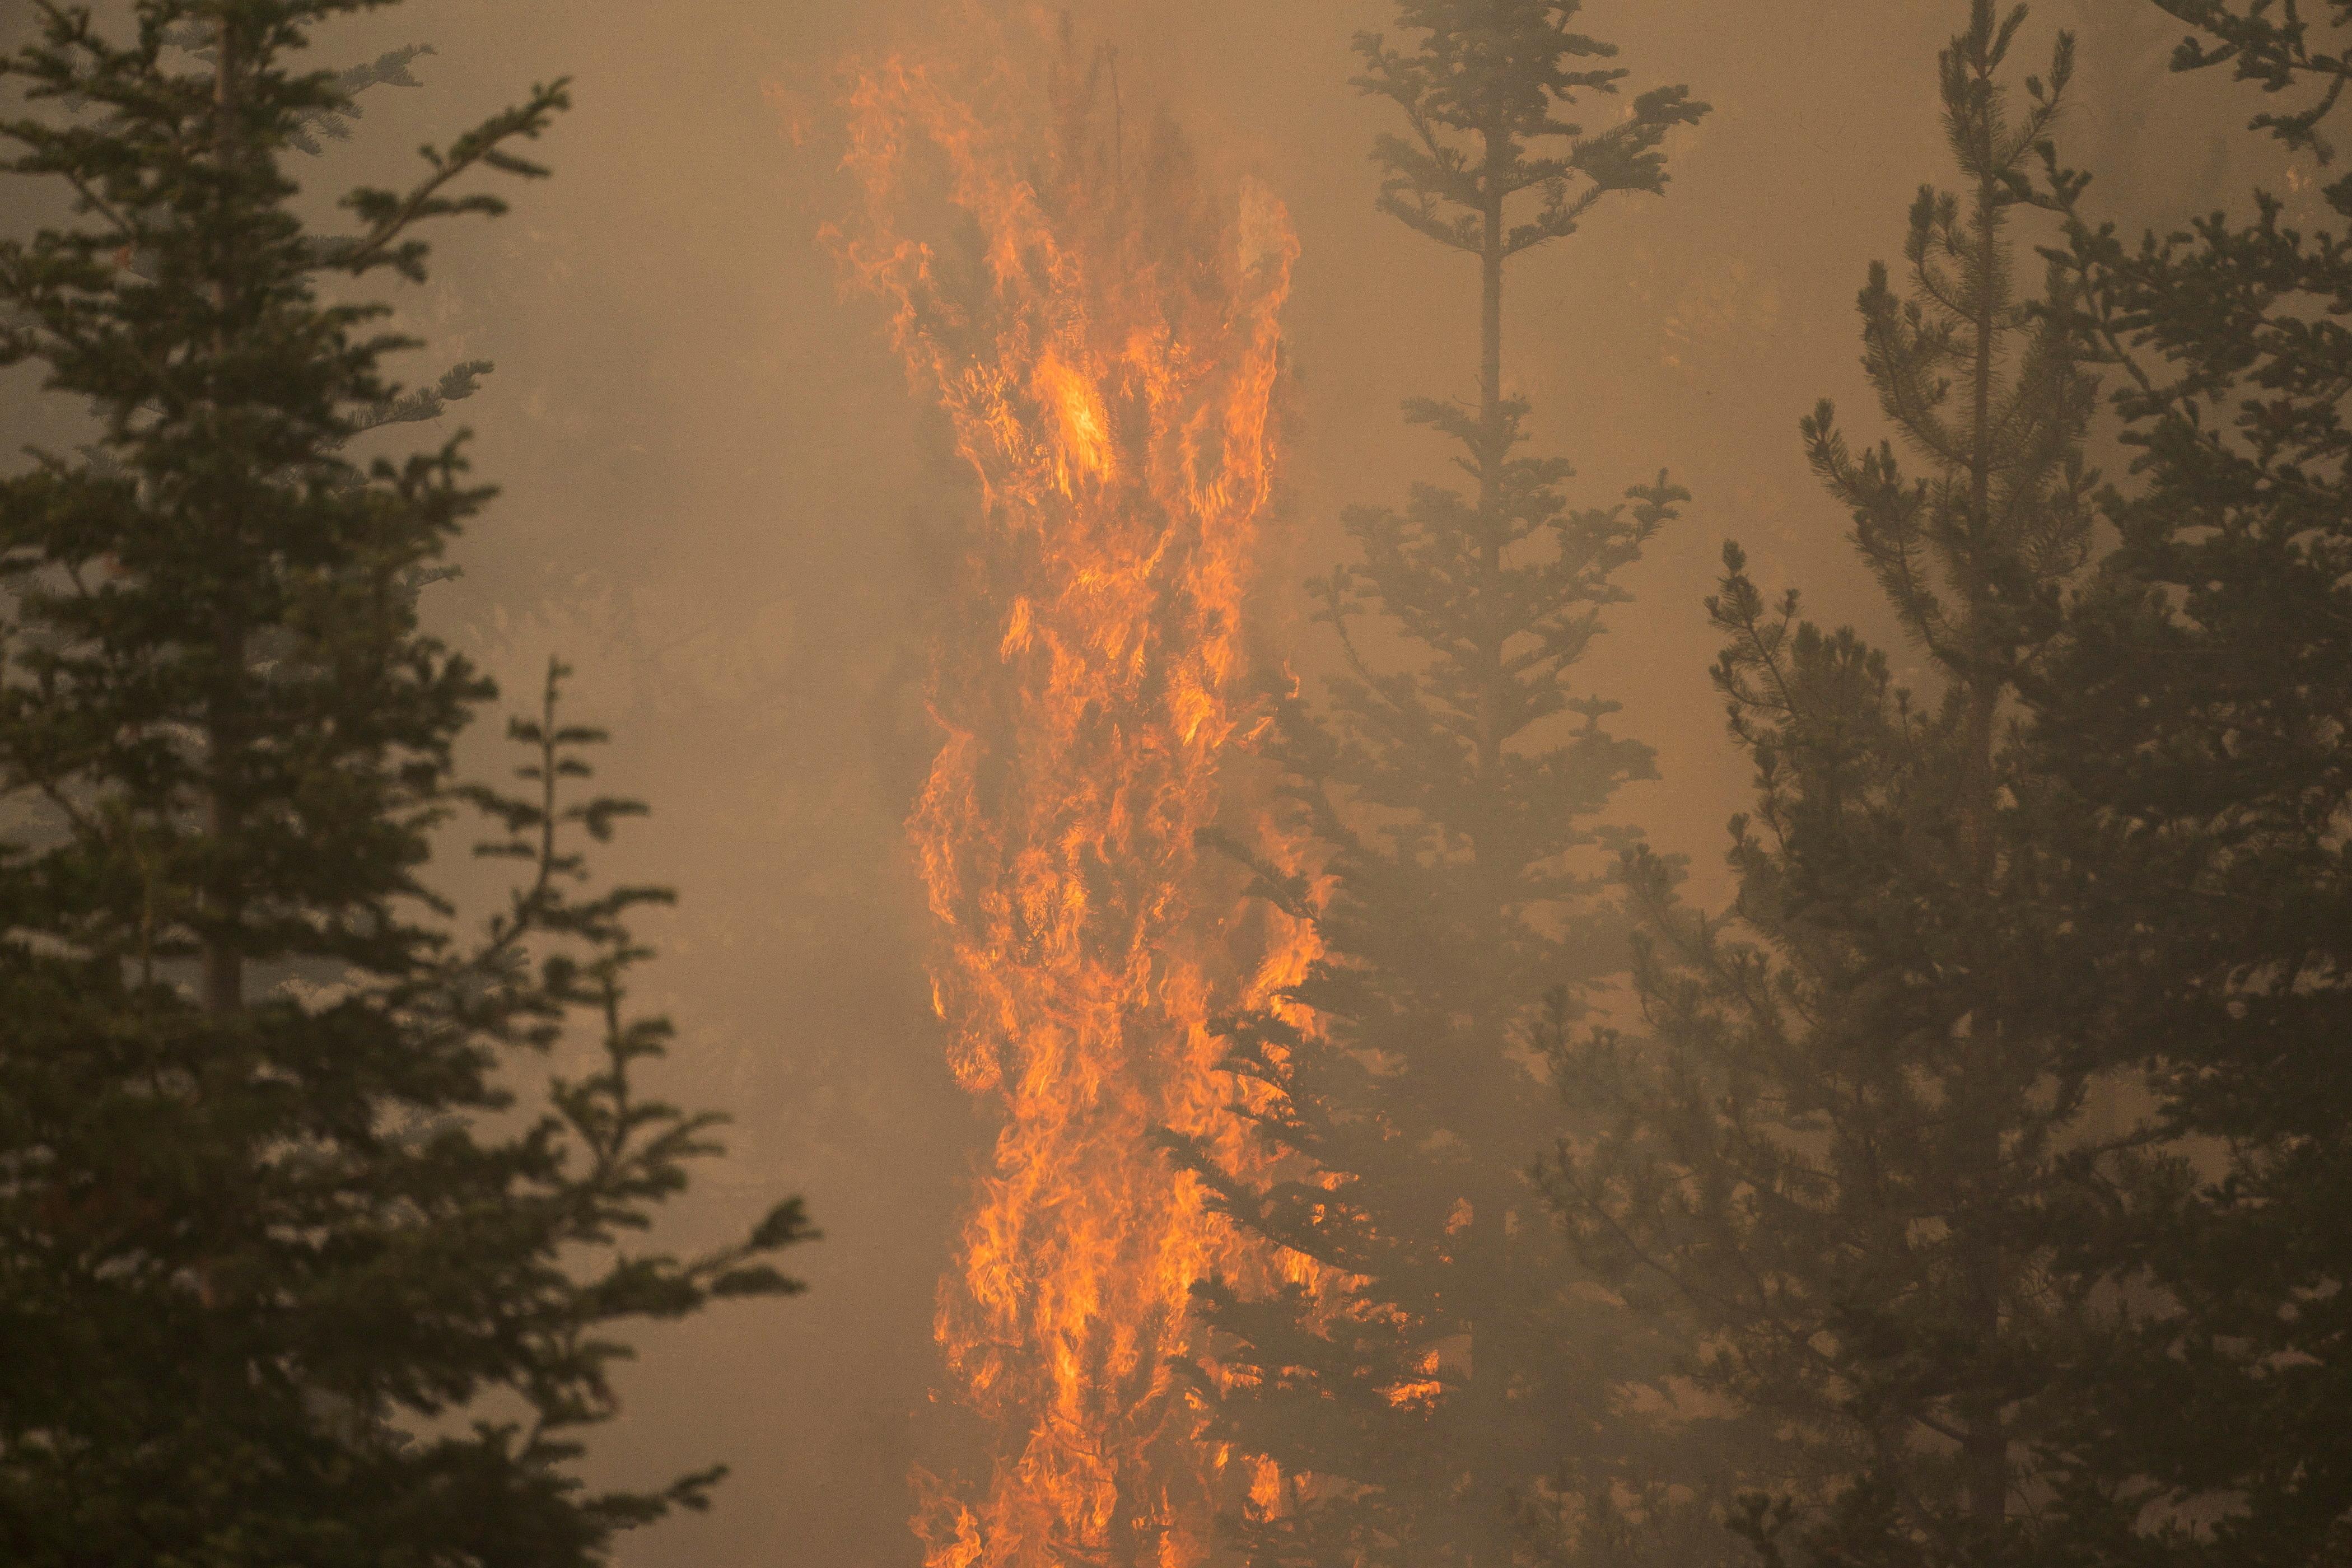 The Bootleg fire burns through vegetation near Paisley, Oregon, U.S., July 20, 2021. REUTERS/David Ryder/File Photo